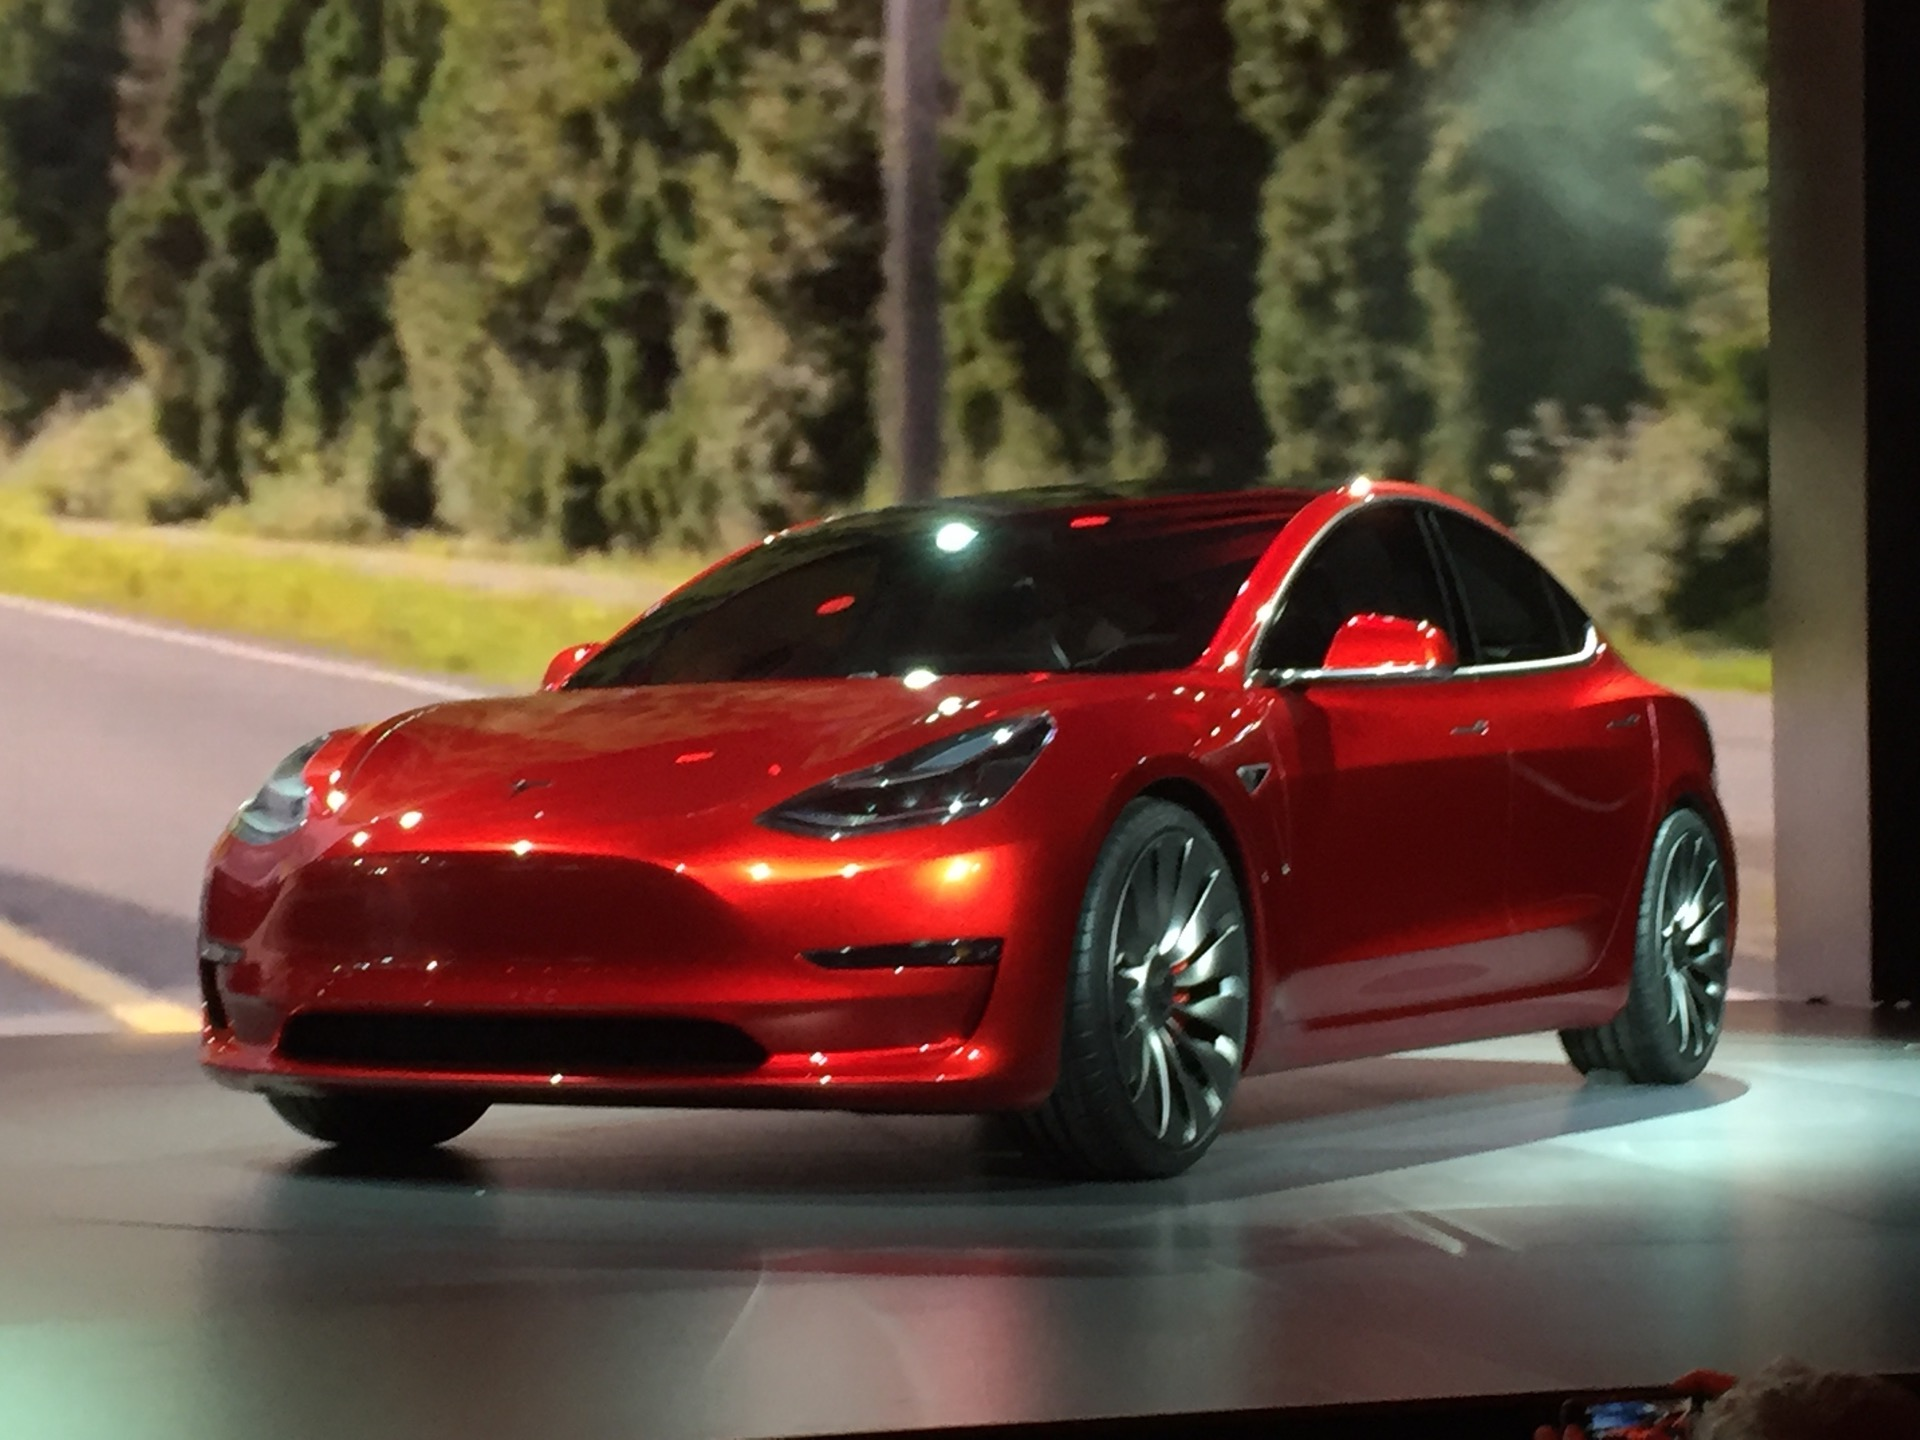 Tesla Model 3, Nissan automatic braking, Subaru BRZ tS: What